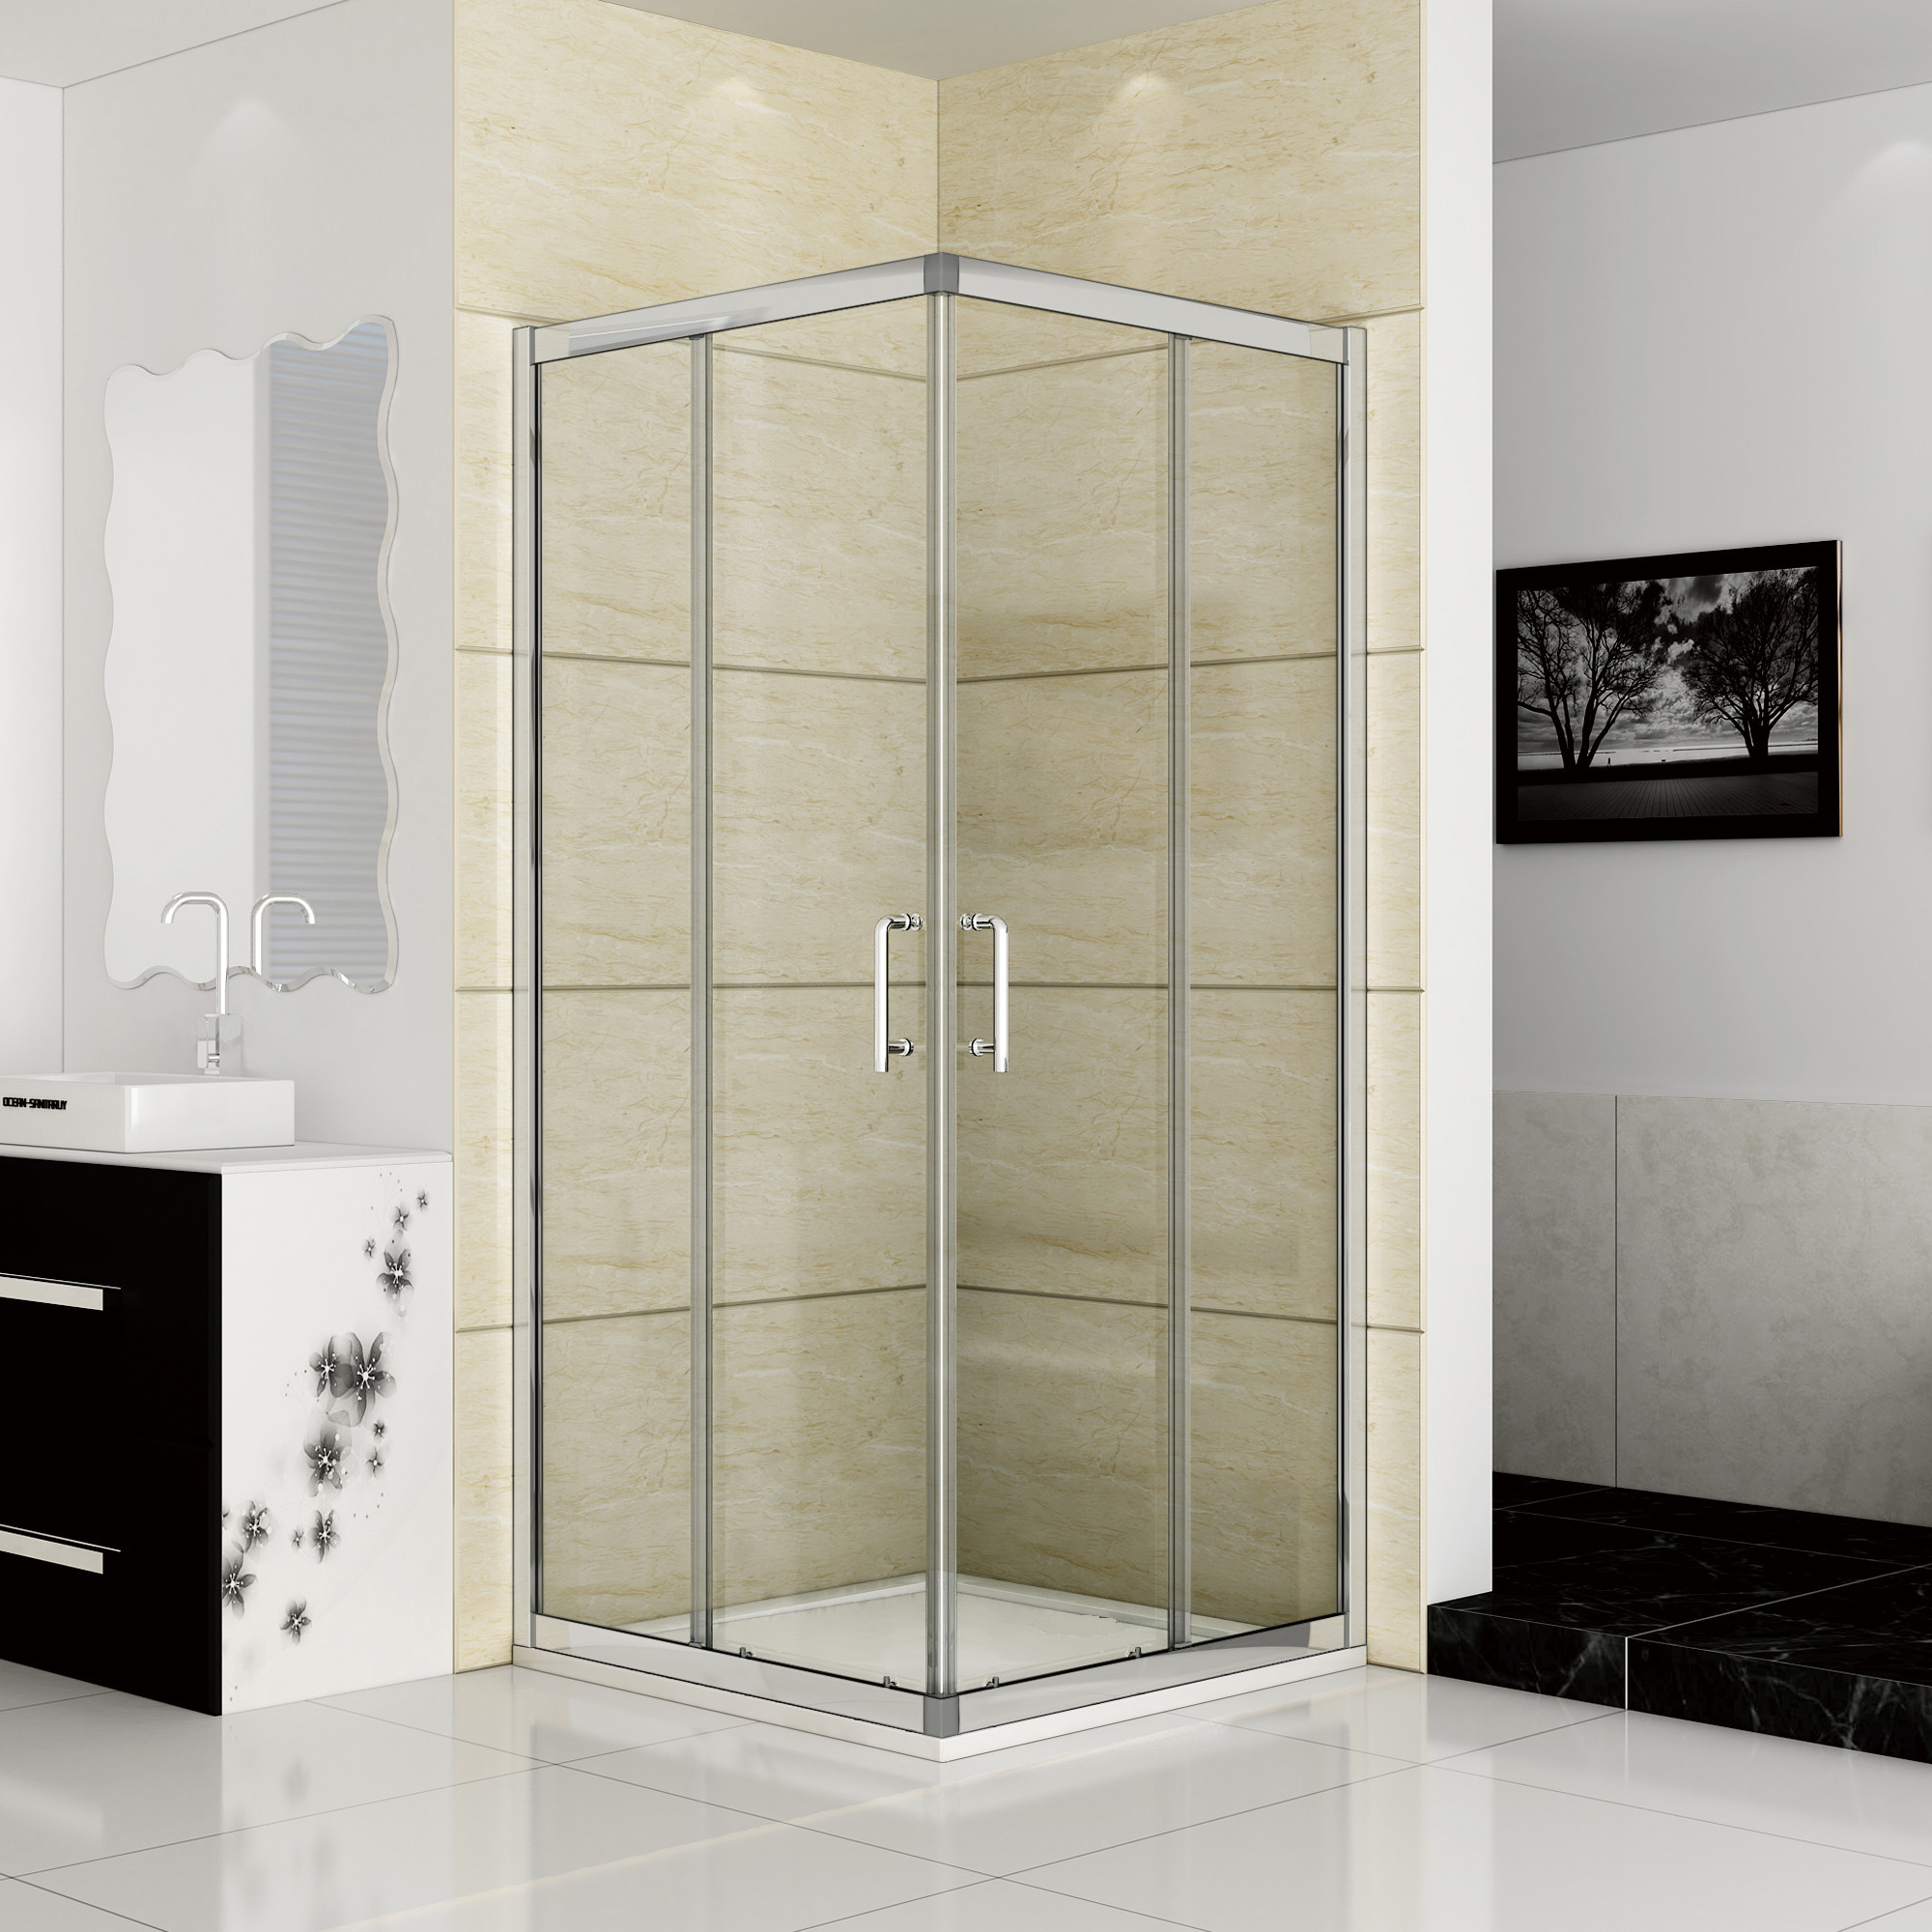 2000 #787053  Sliding Shower Enclosure Corner Entry Glass Cubicle Double Door EBay image Ebay Entry Doors 41532000